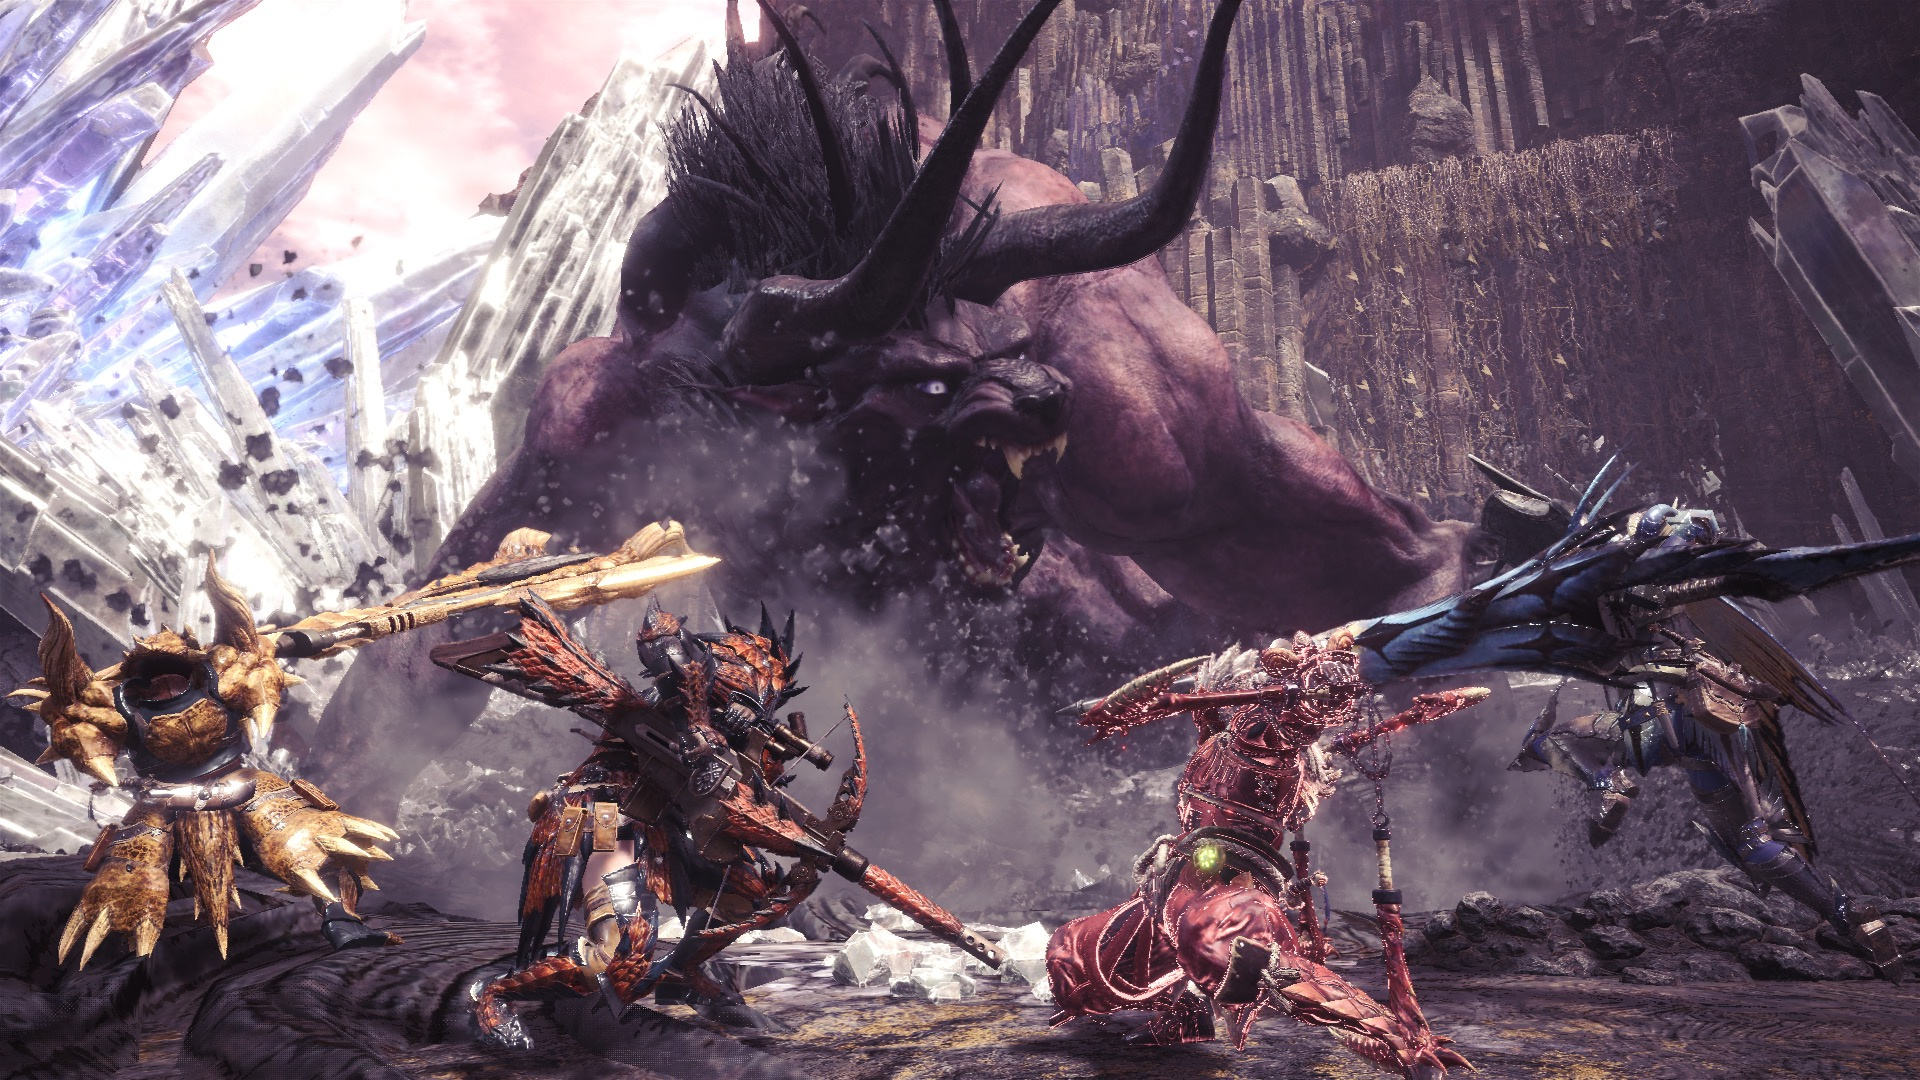 Monster Hunter: World Behemoth Fight - How to Beat Behemoth